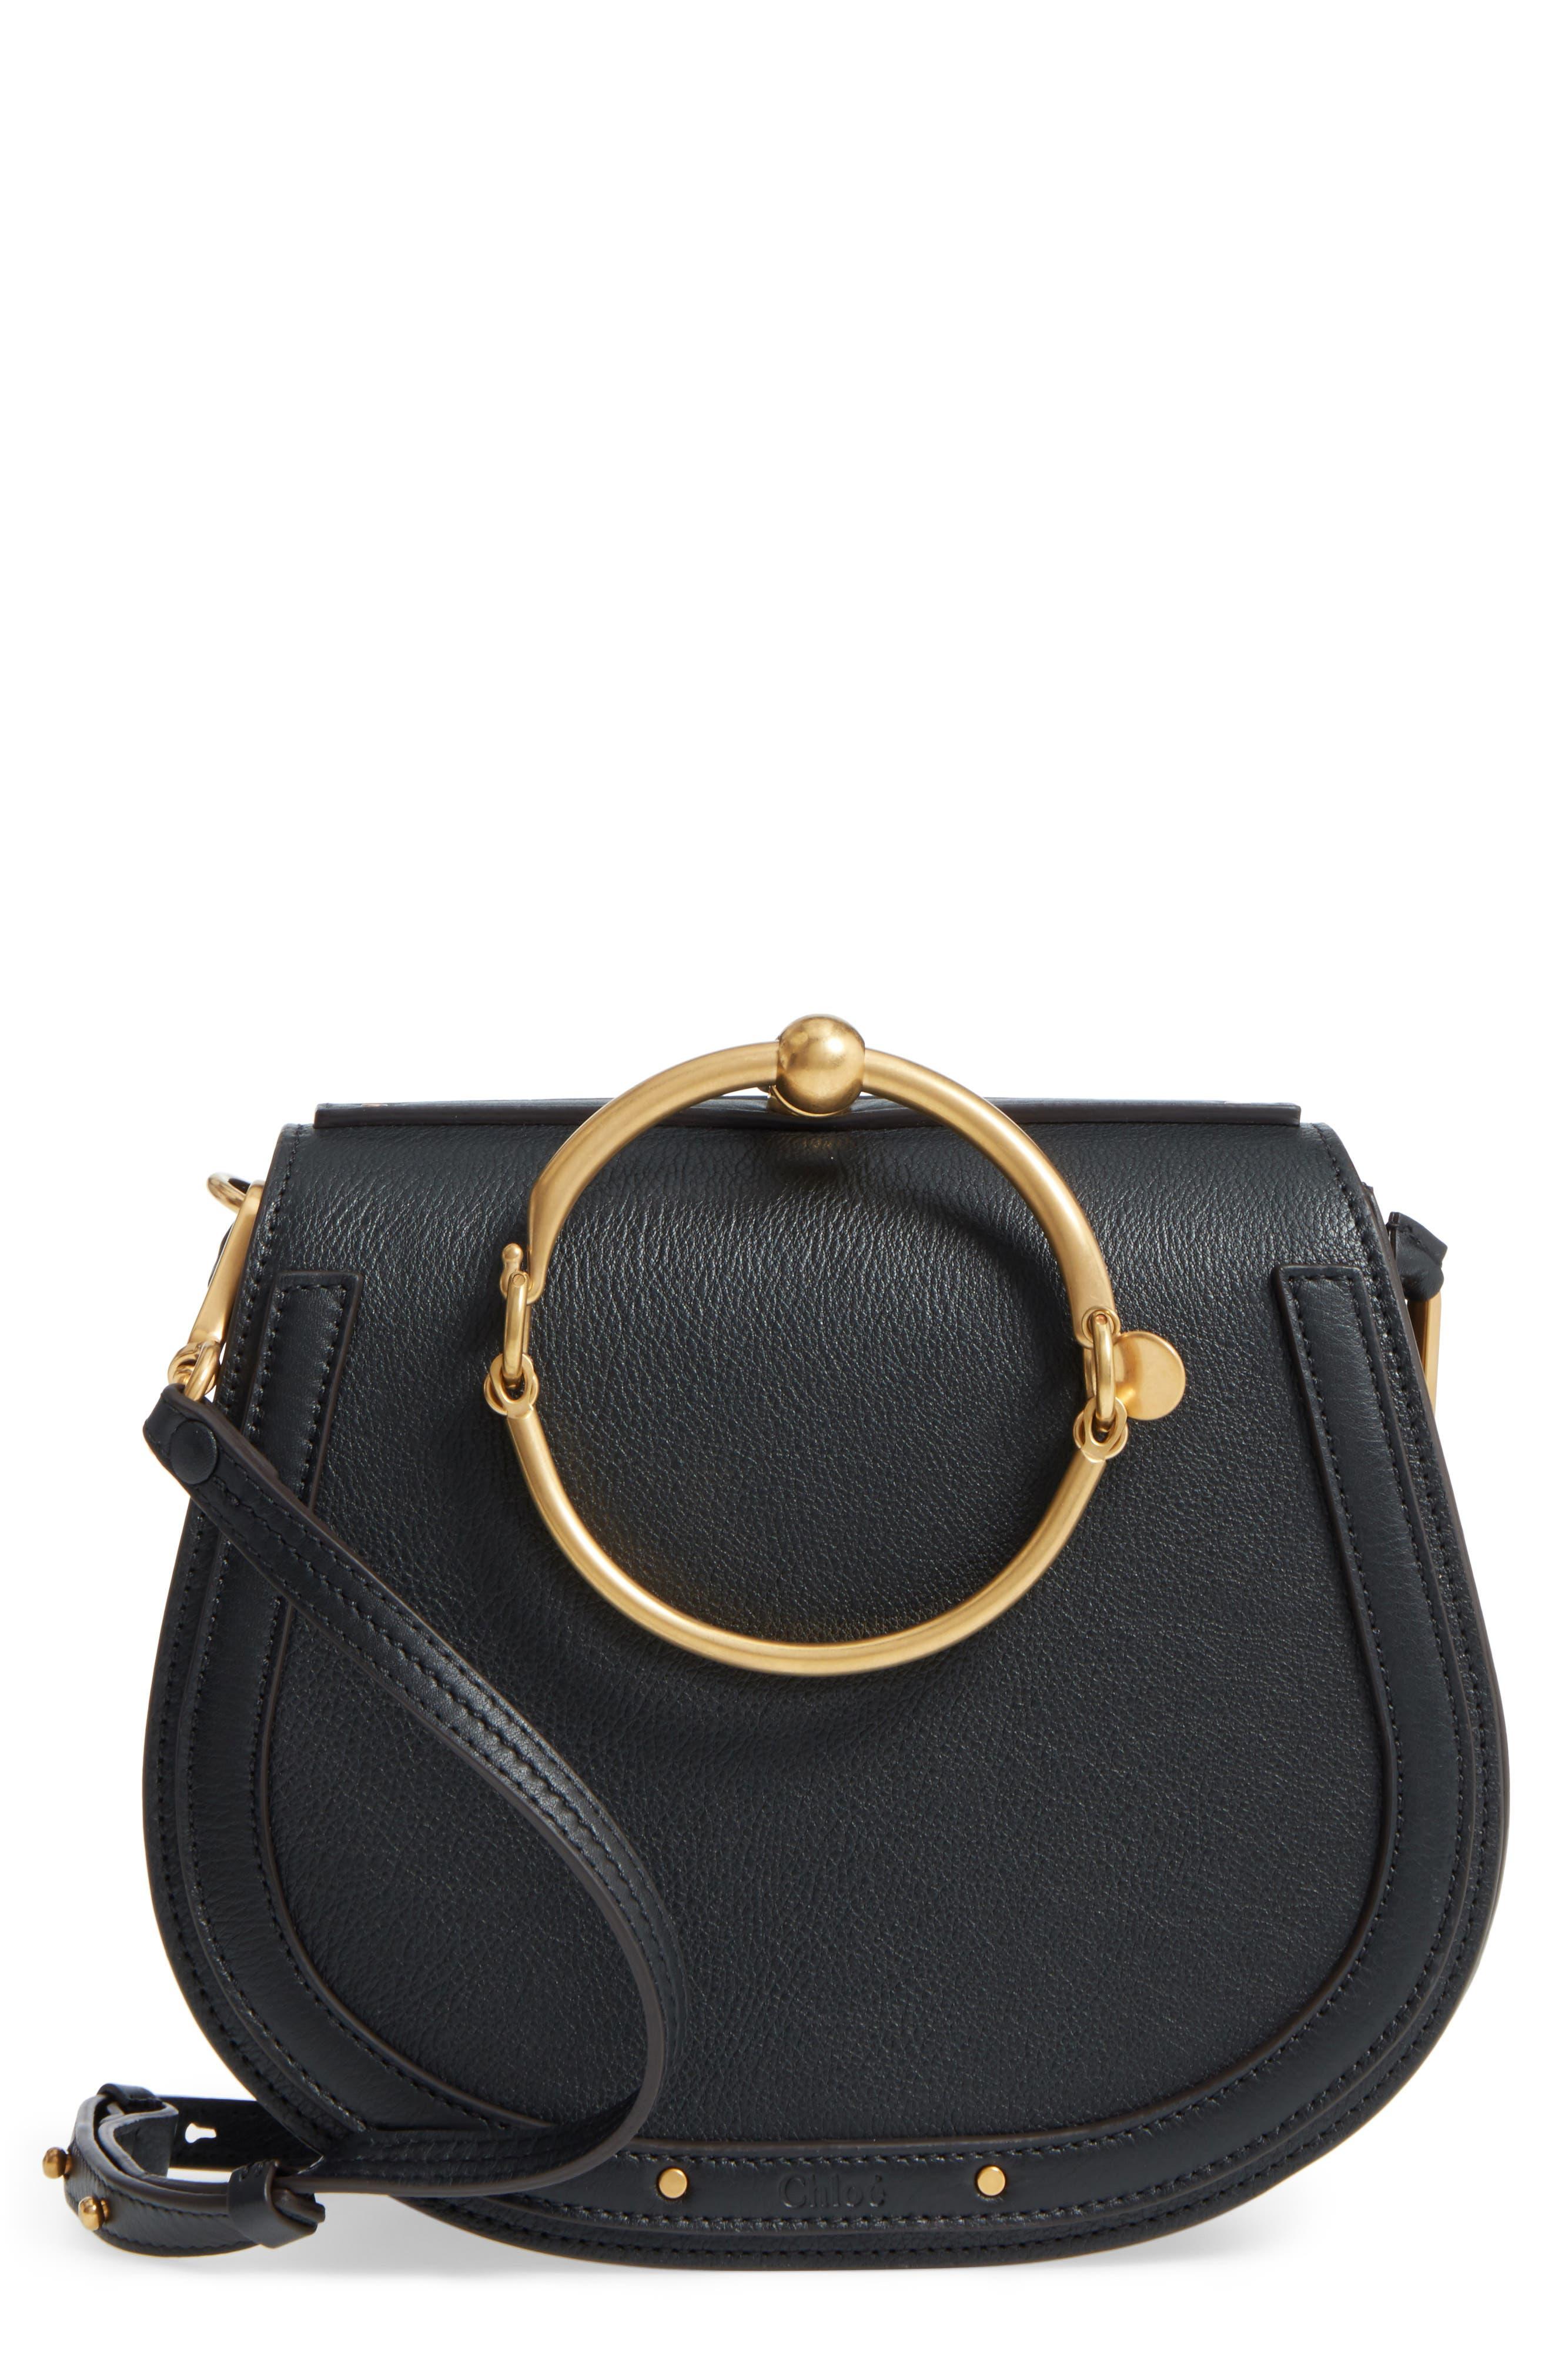 Alternate Image 1 Selected - Chloé Medium Nile Leather Bracelet Saddle Bag